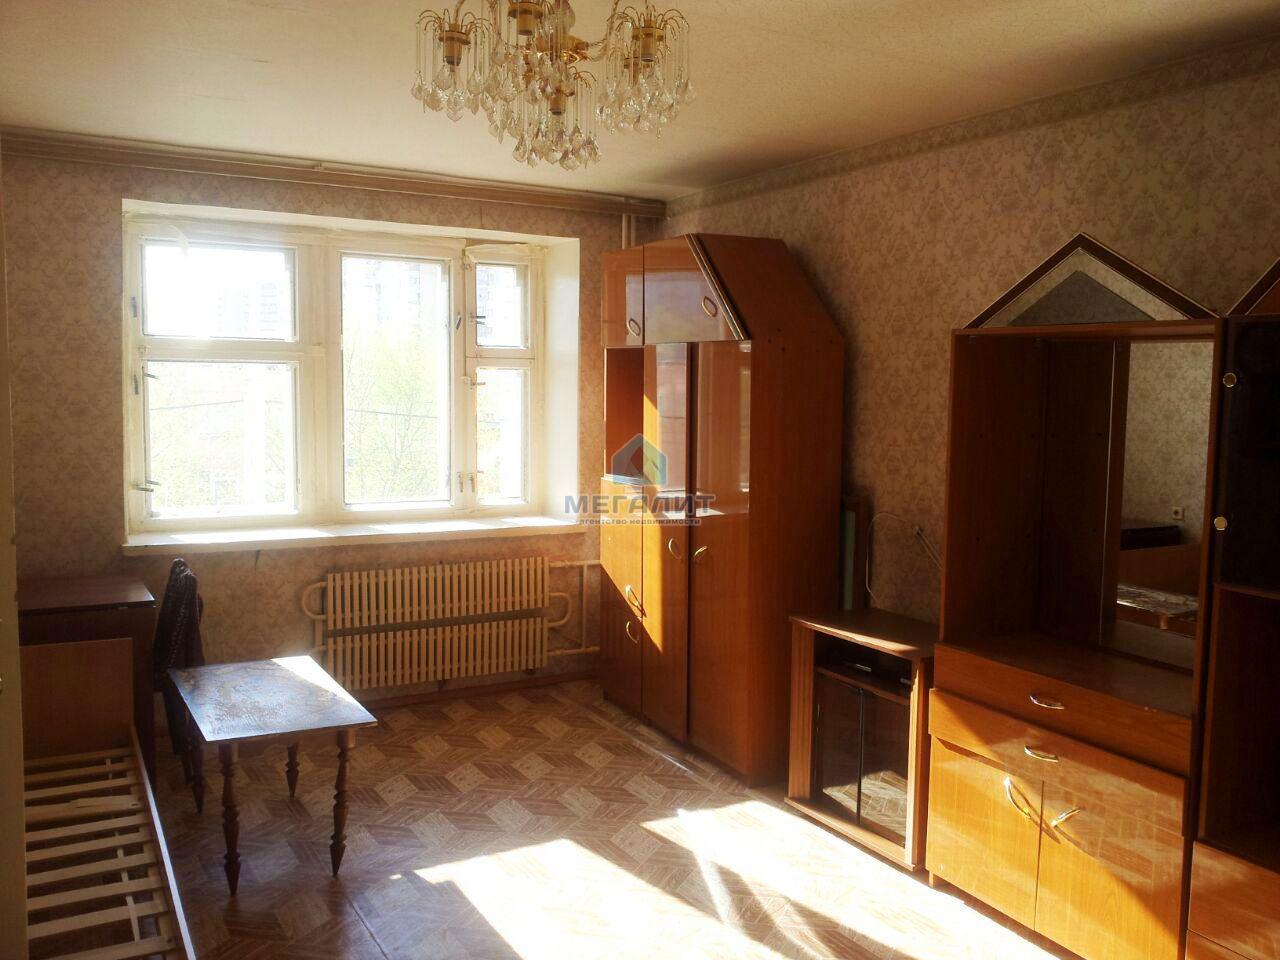 Двухкомнатная квартира в Ново-Савиновском районе! (миниатюра №1)